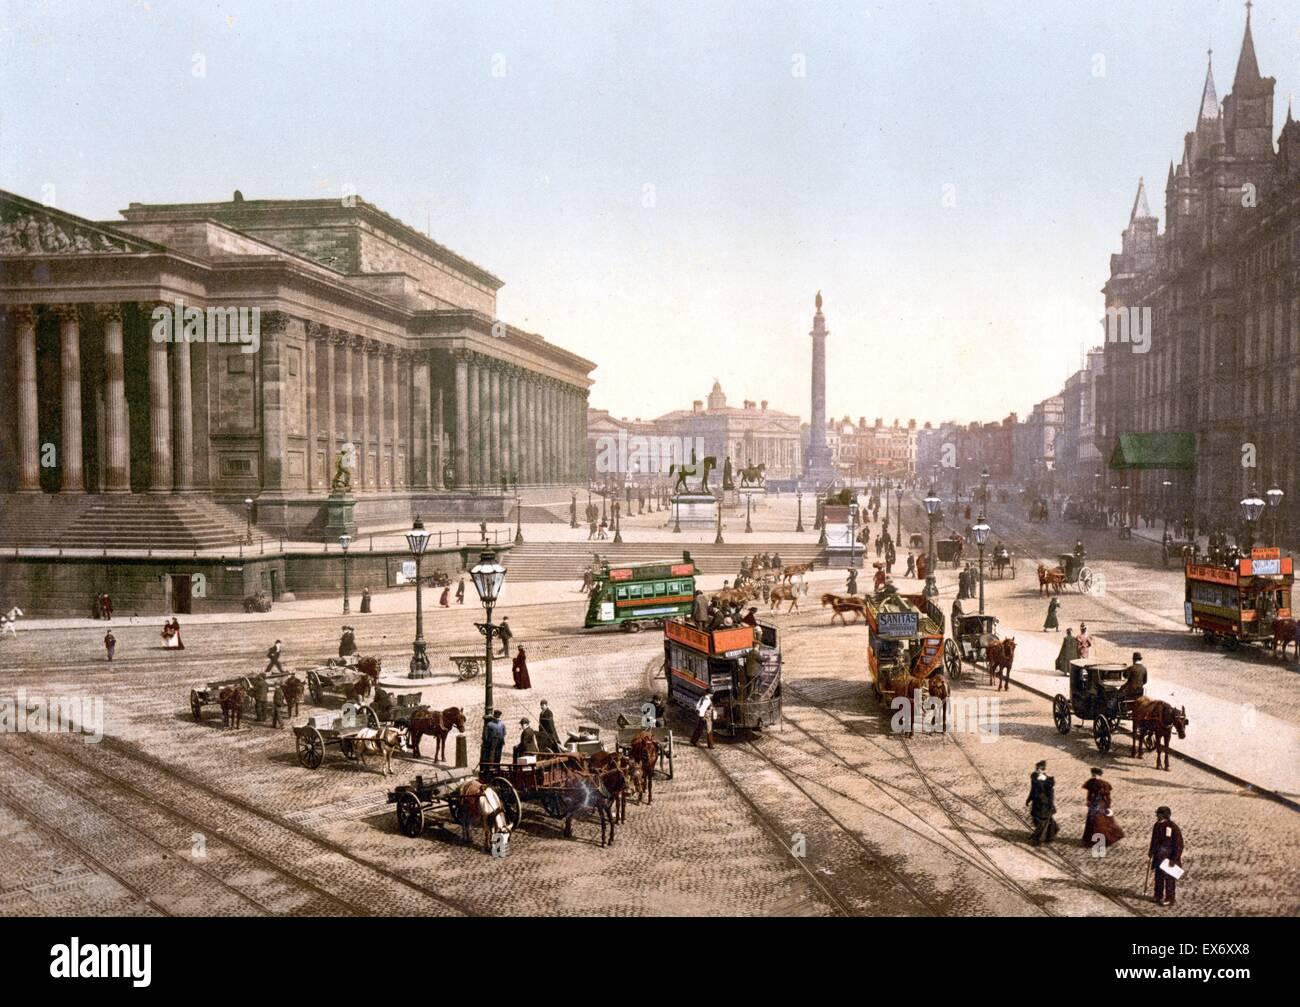 St. George's Hall, Liverpool, England 1890 - Stock Image